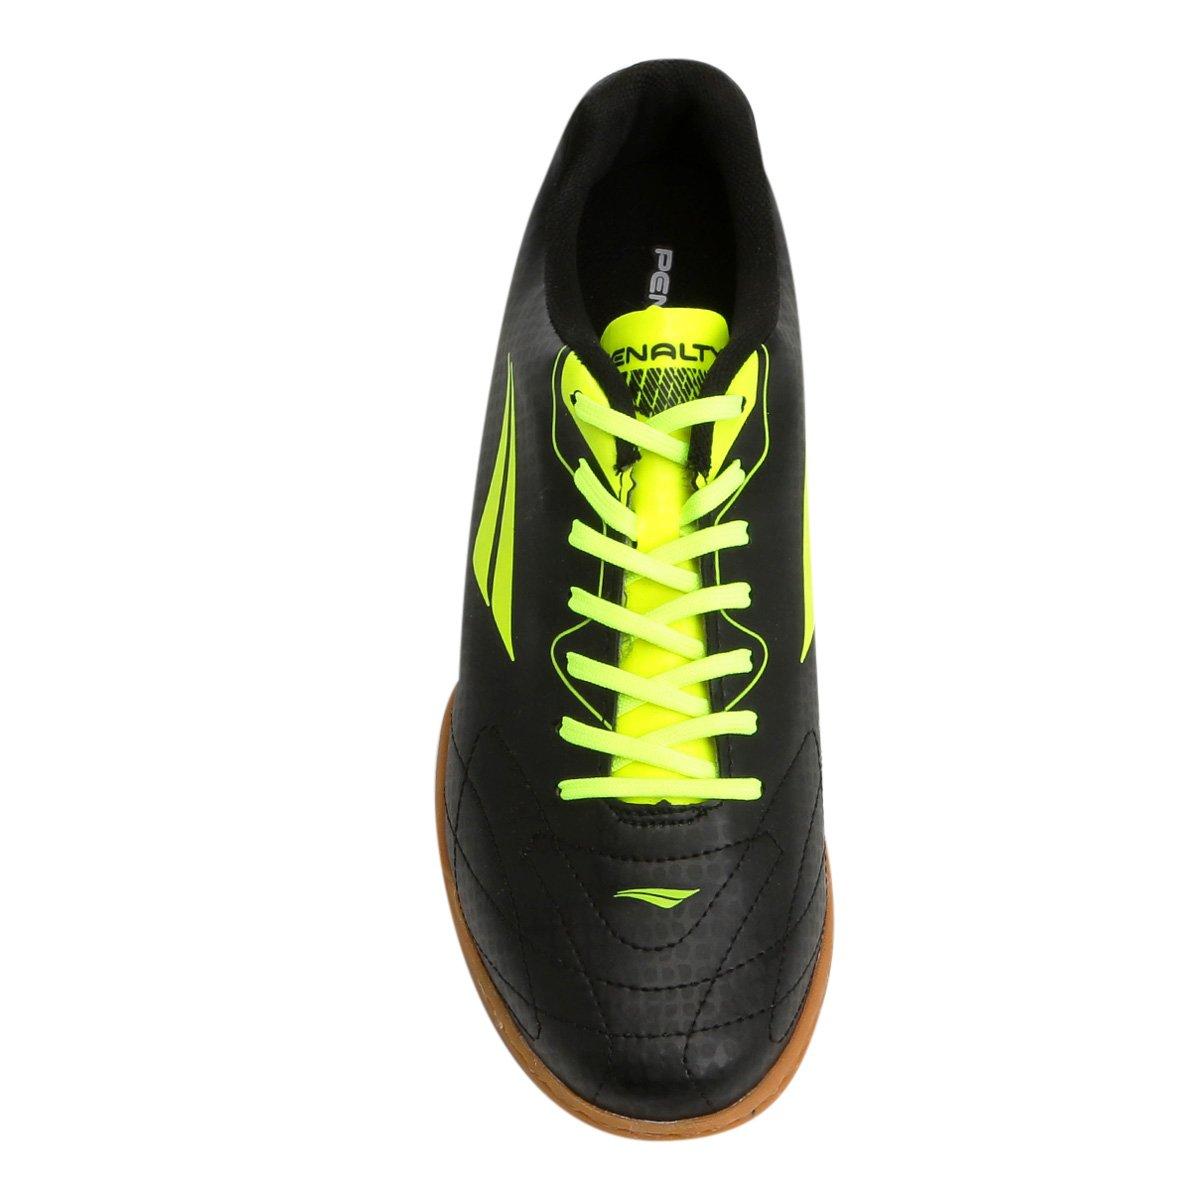 fb8e1e5a98 Chuteira Futsal Penalty Matis VIII Masculina - Preto e Amarelo ...